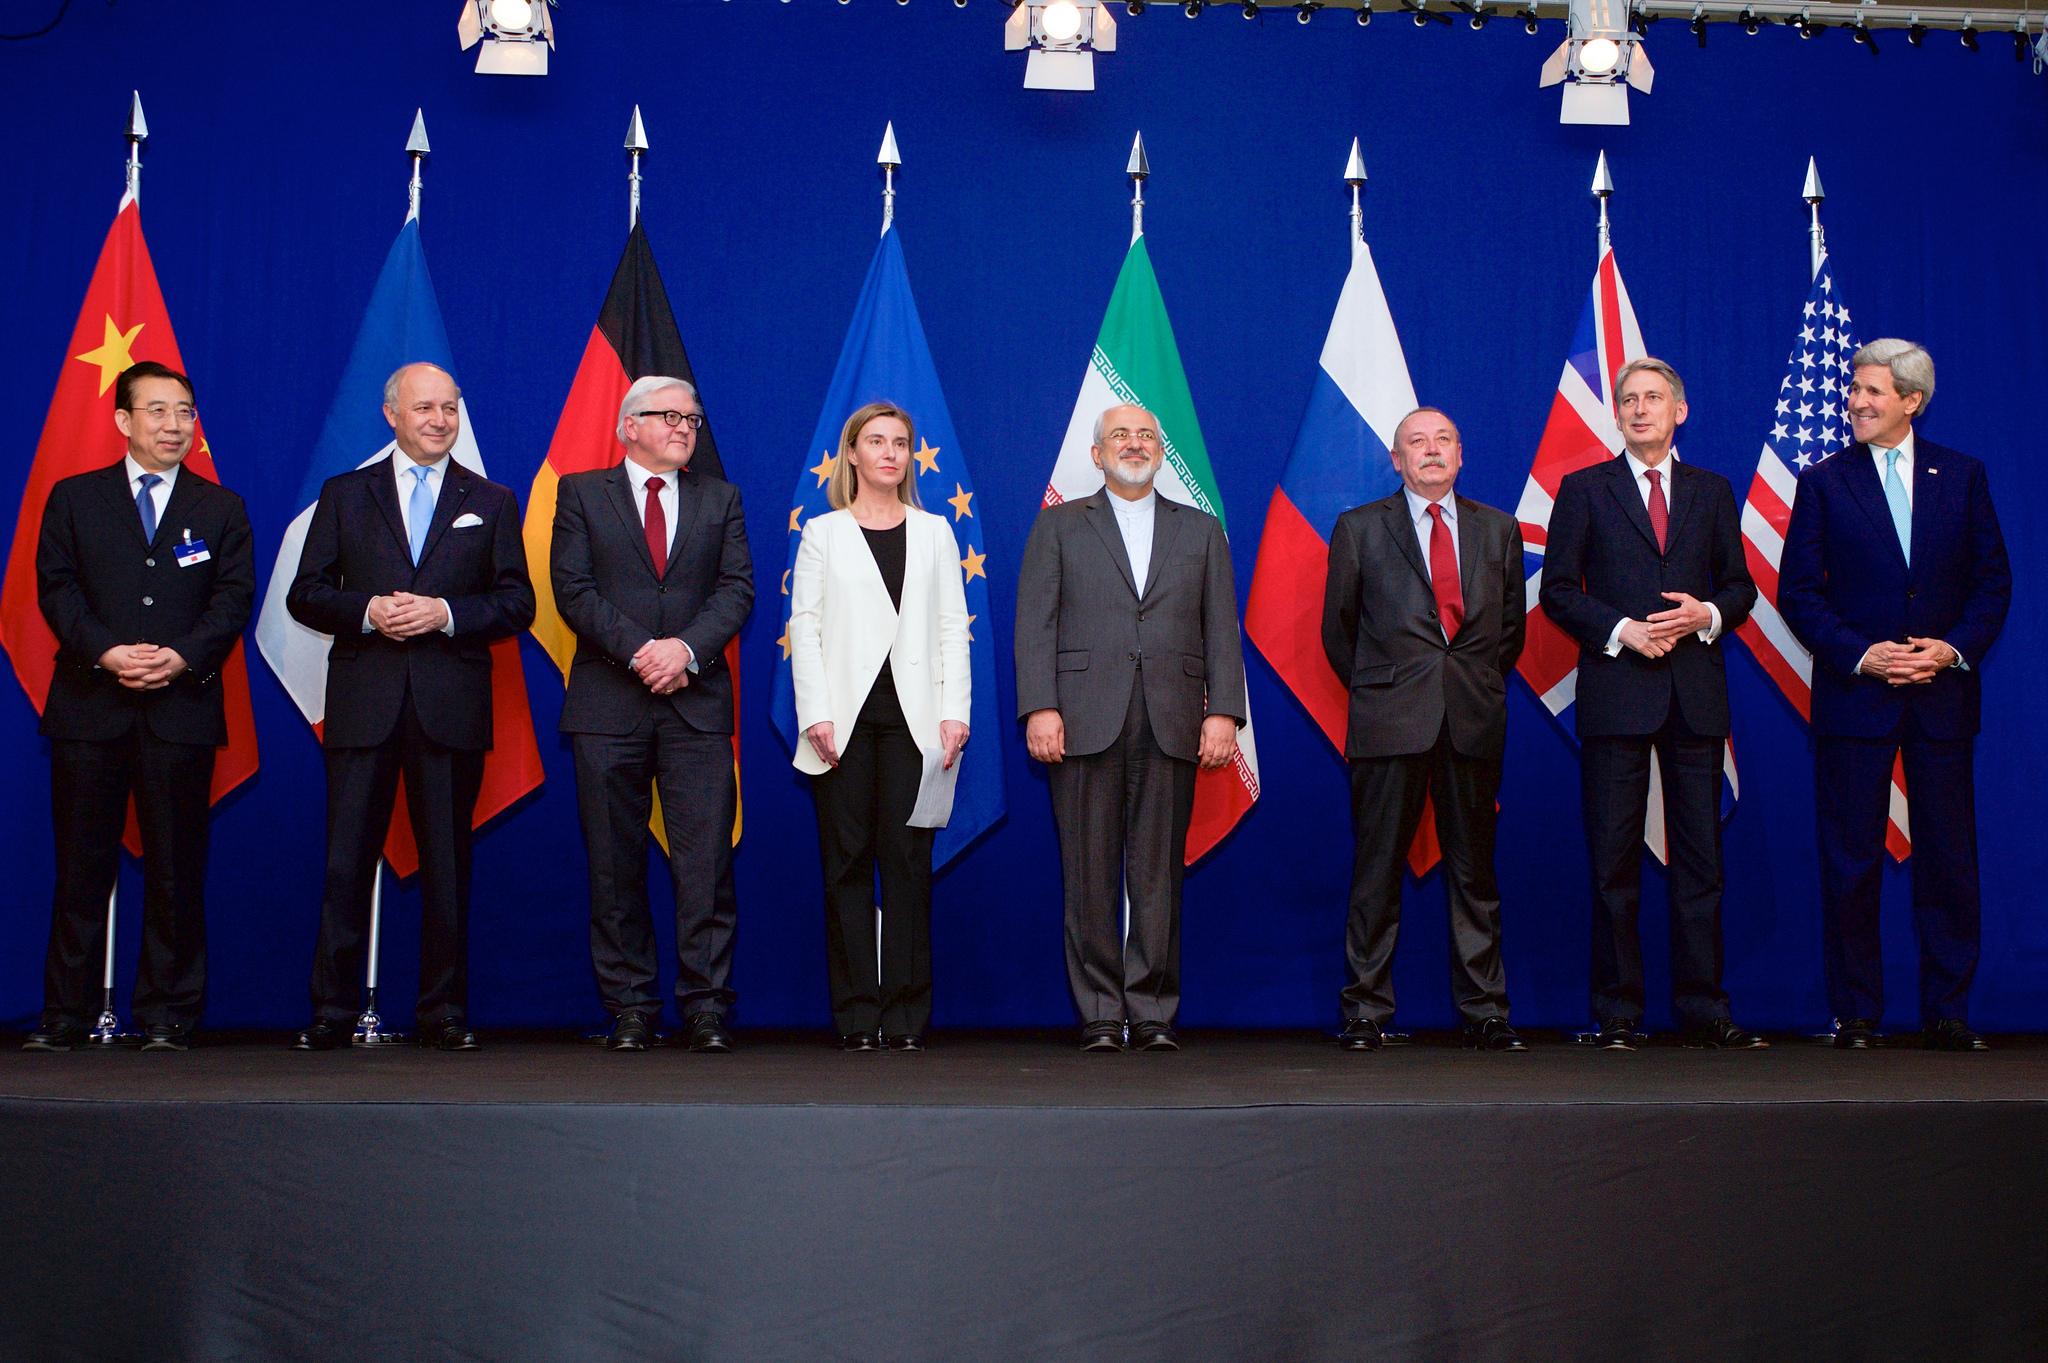 A Long Road Reaches Iran Deal, But No Guarantees Going Forward